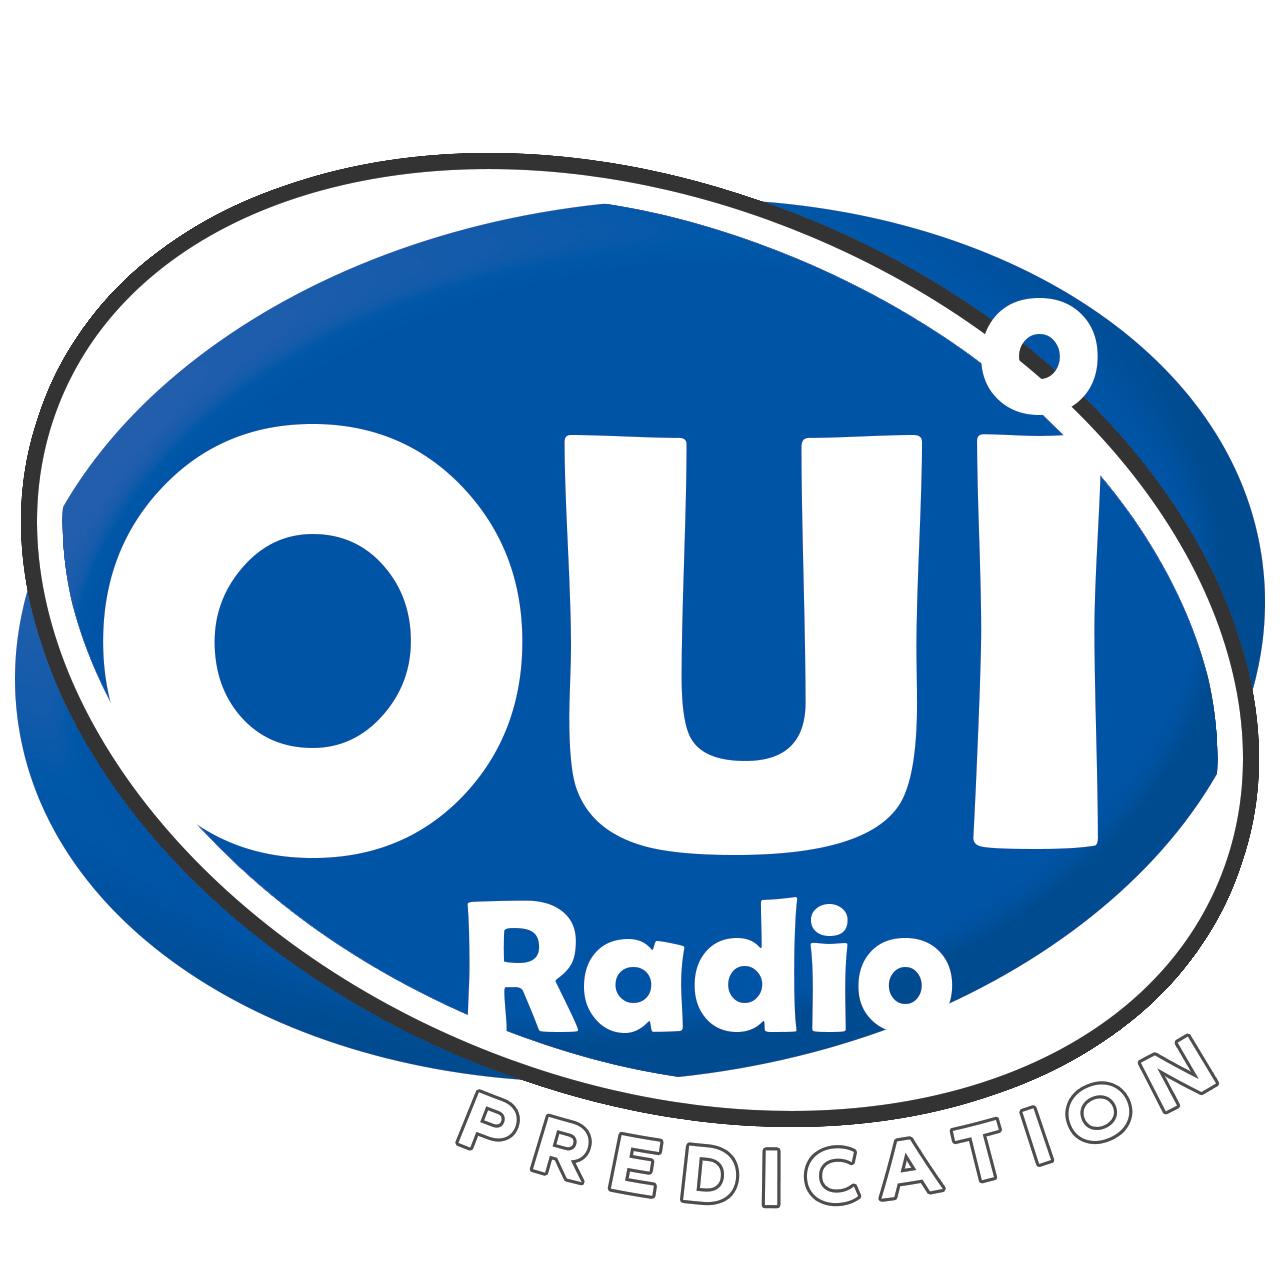 OUI Radio Predication